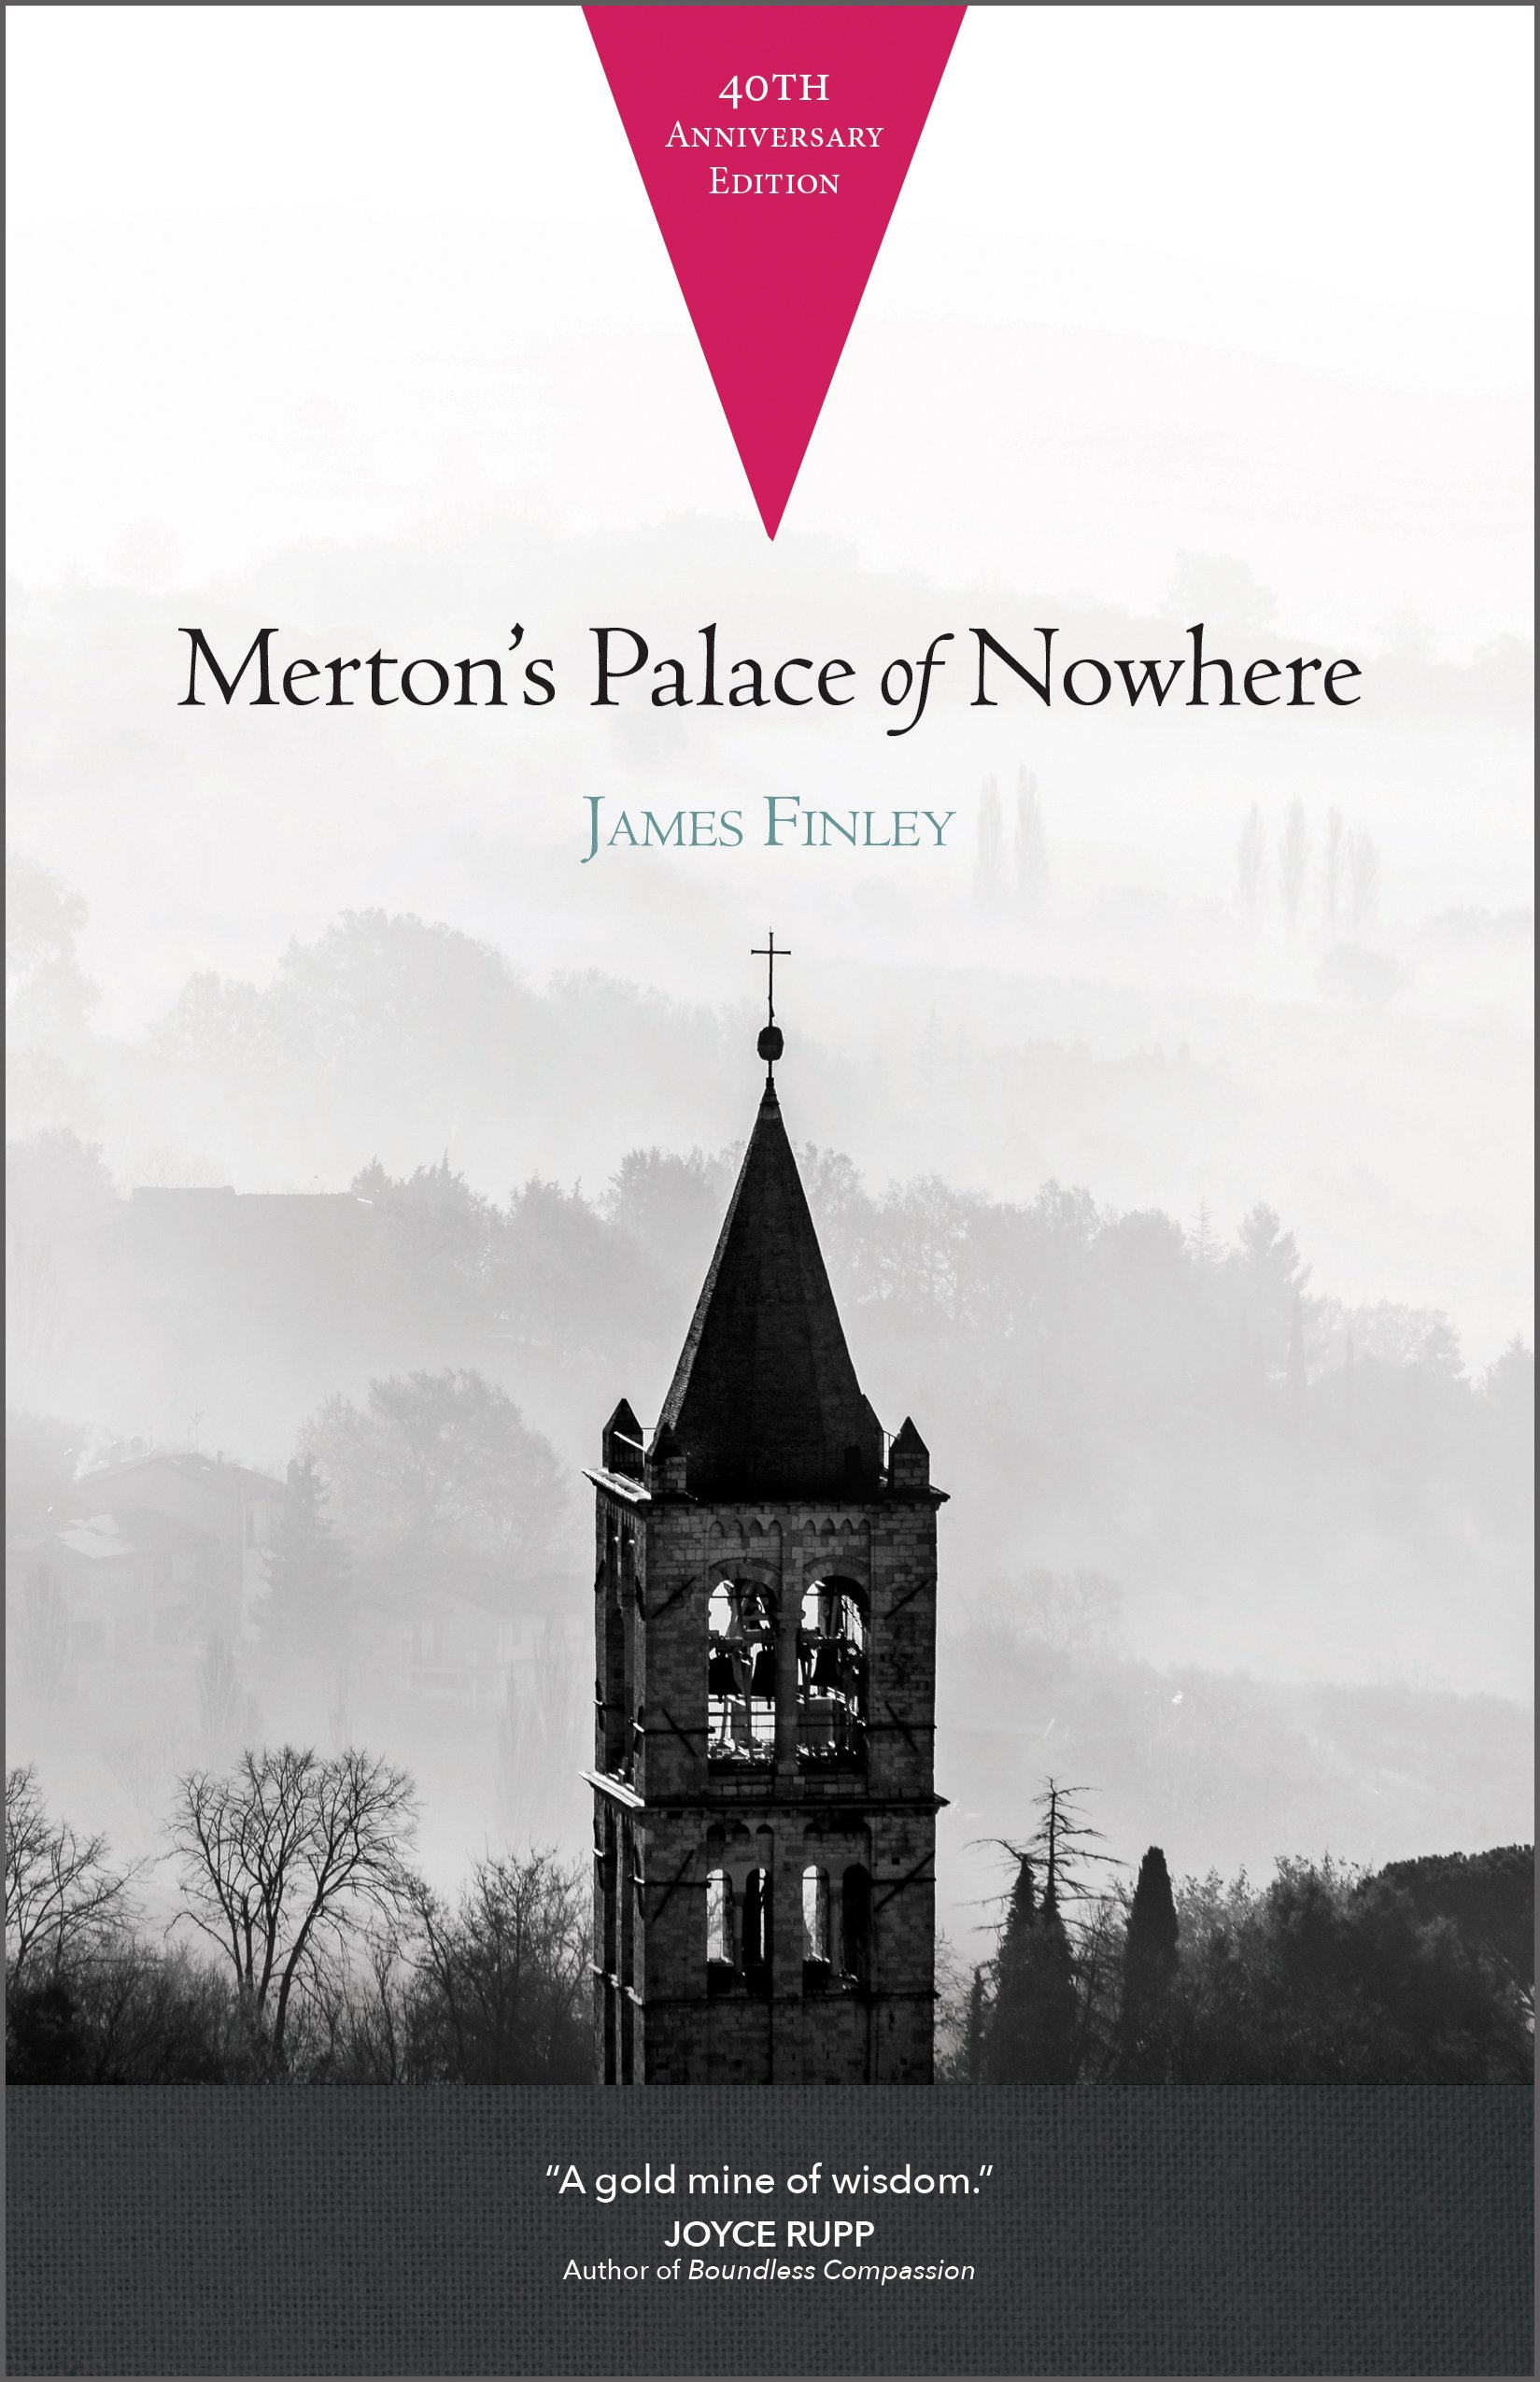 Merton's Palace of Nowhere: James Finley: 9780877930419: Amazon.com: Books